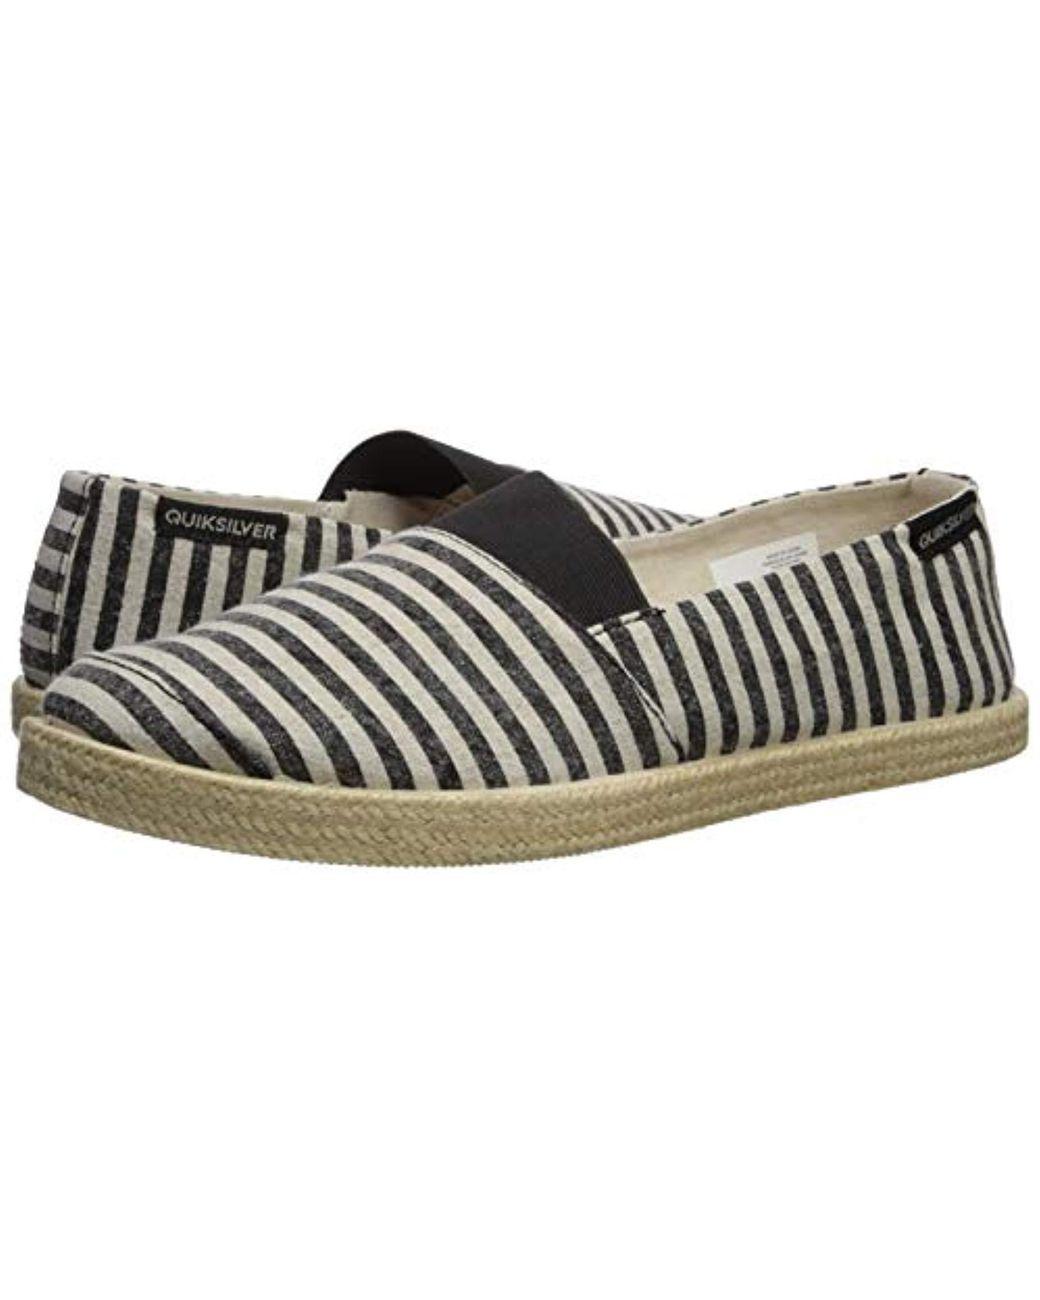 8ebb9e31f688c Quiksilver Espadrilled M Shoe Xkkc Men's Espadrilles / Casual Shoes In Black  in Black for Men - Save 3% - Lyst